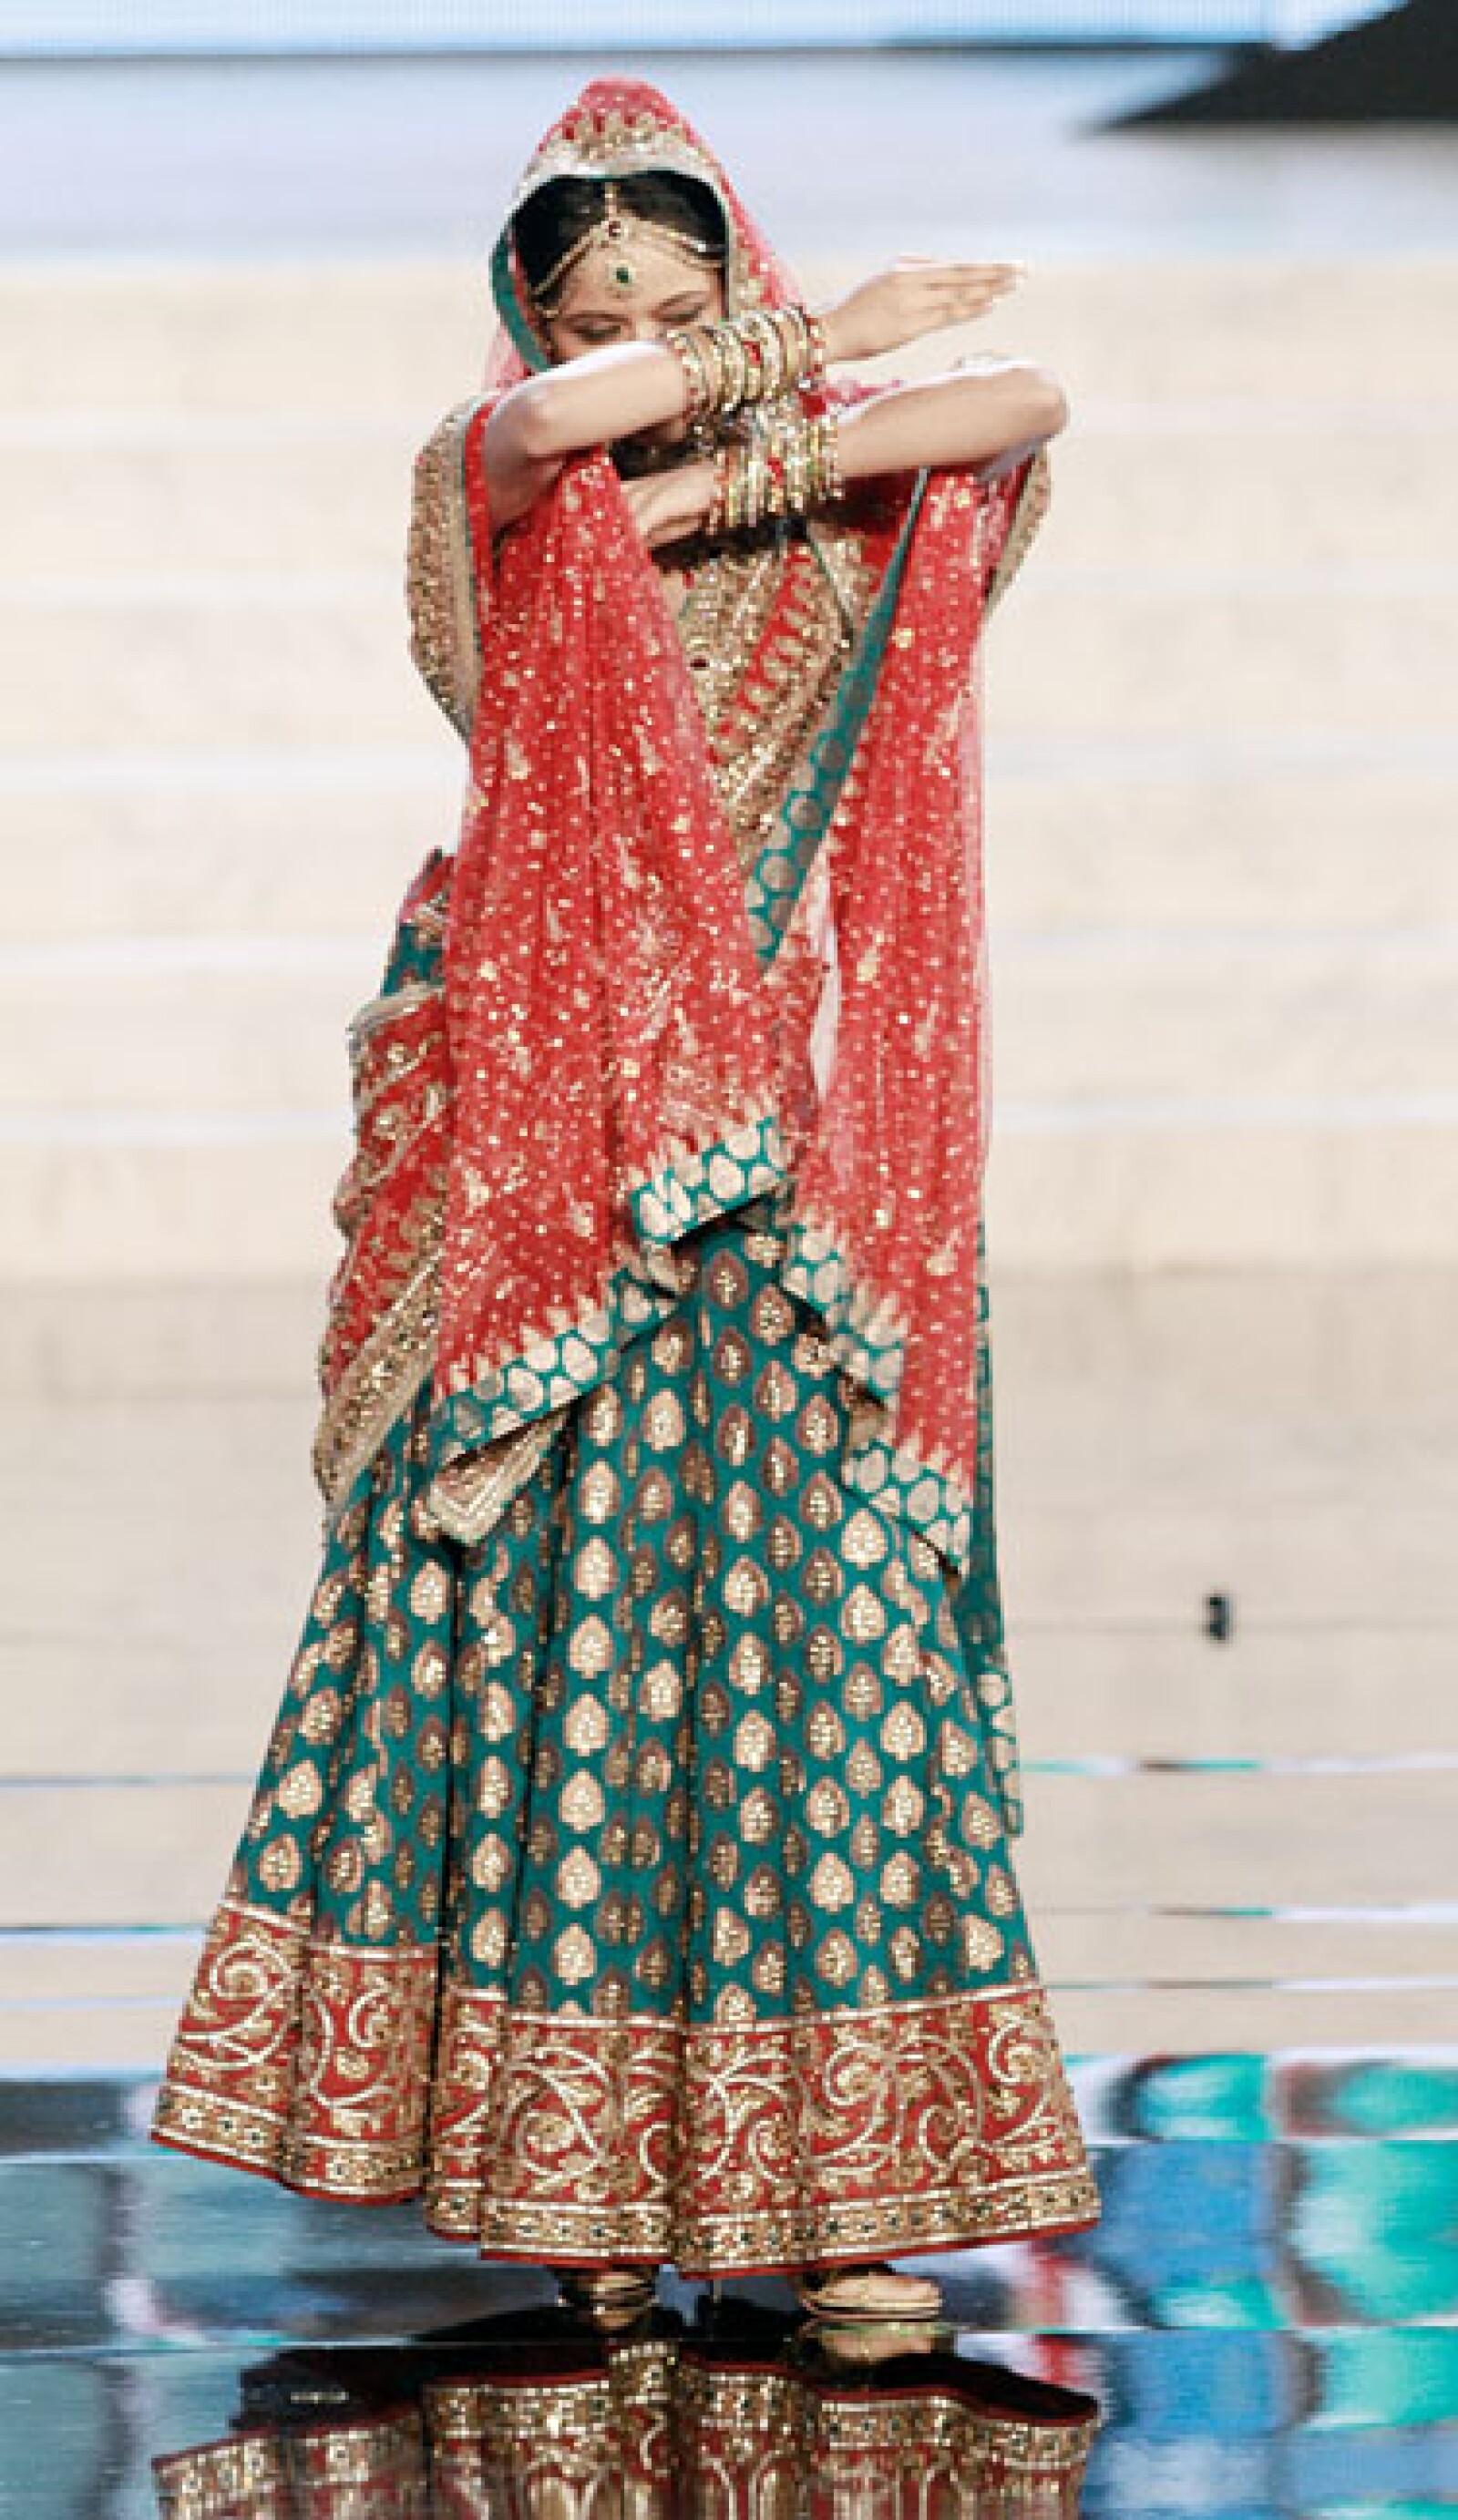 Miss India, Shilpa Singh.